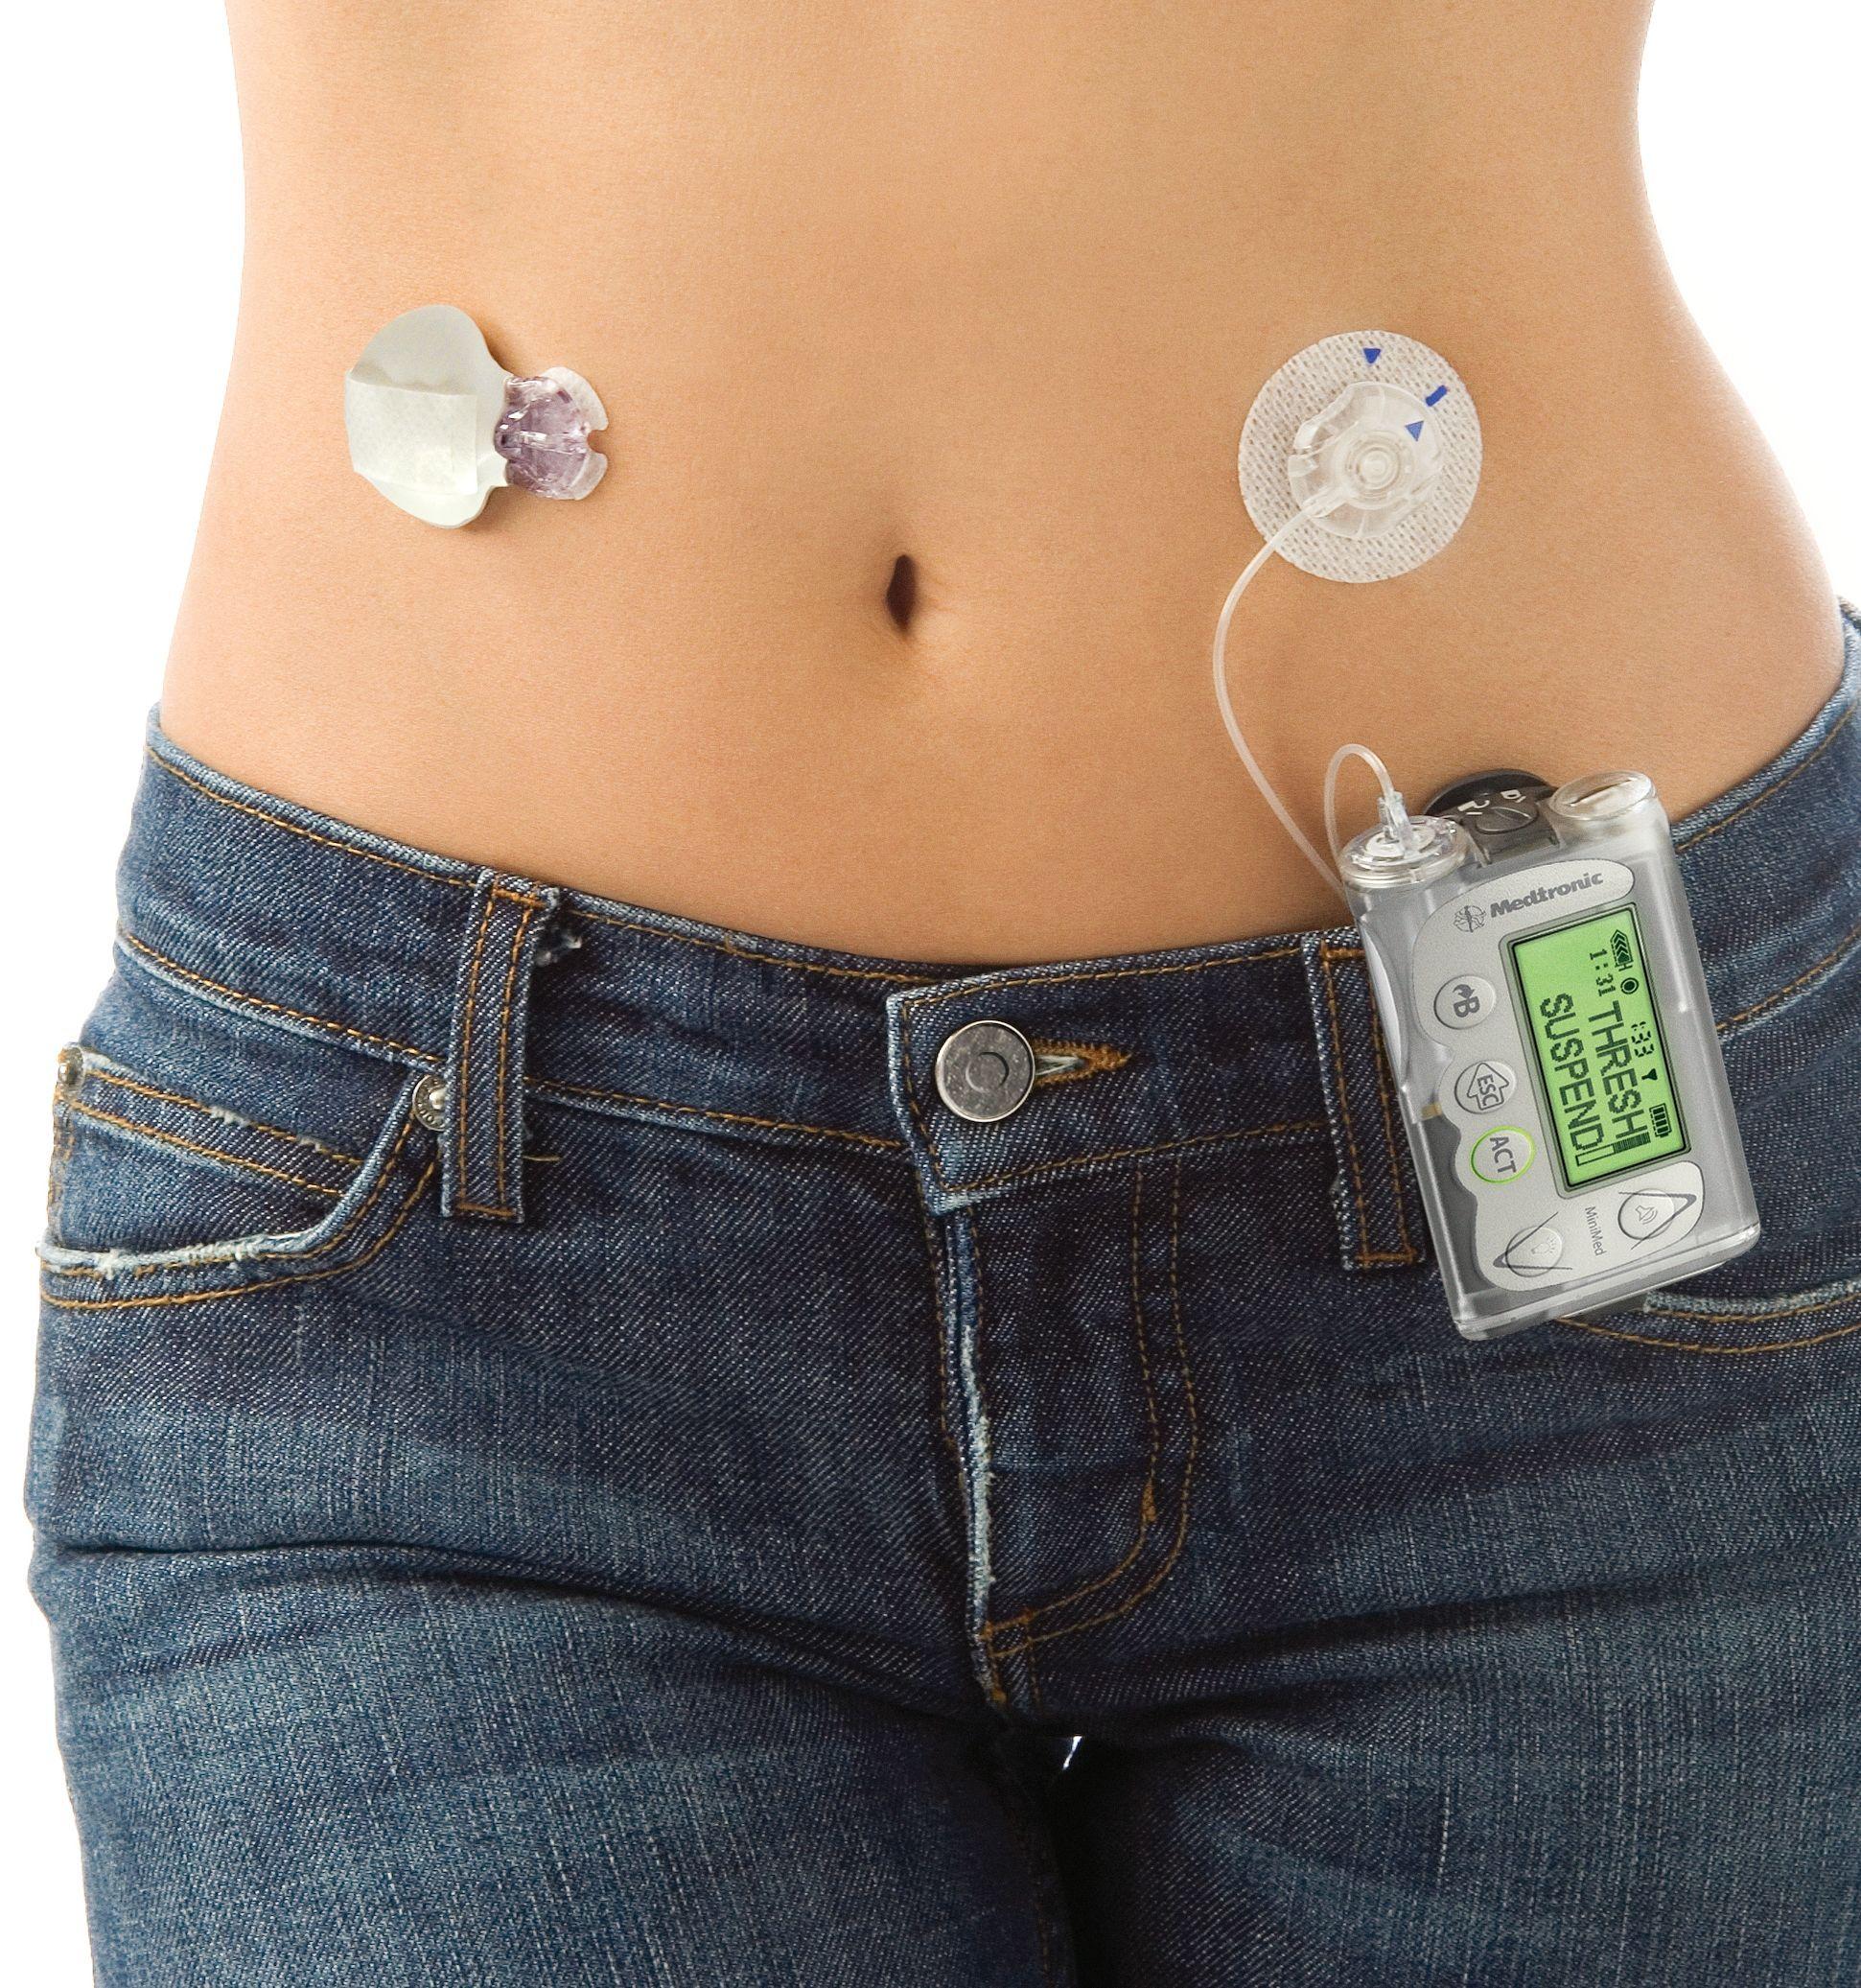 pérdida de peso cgm